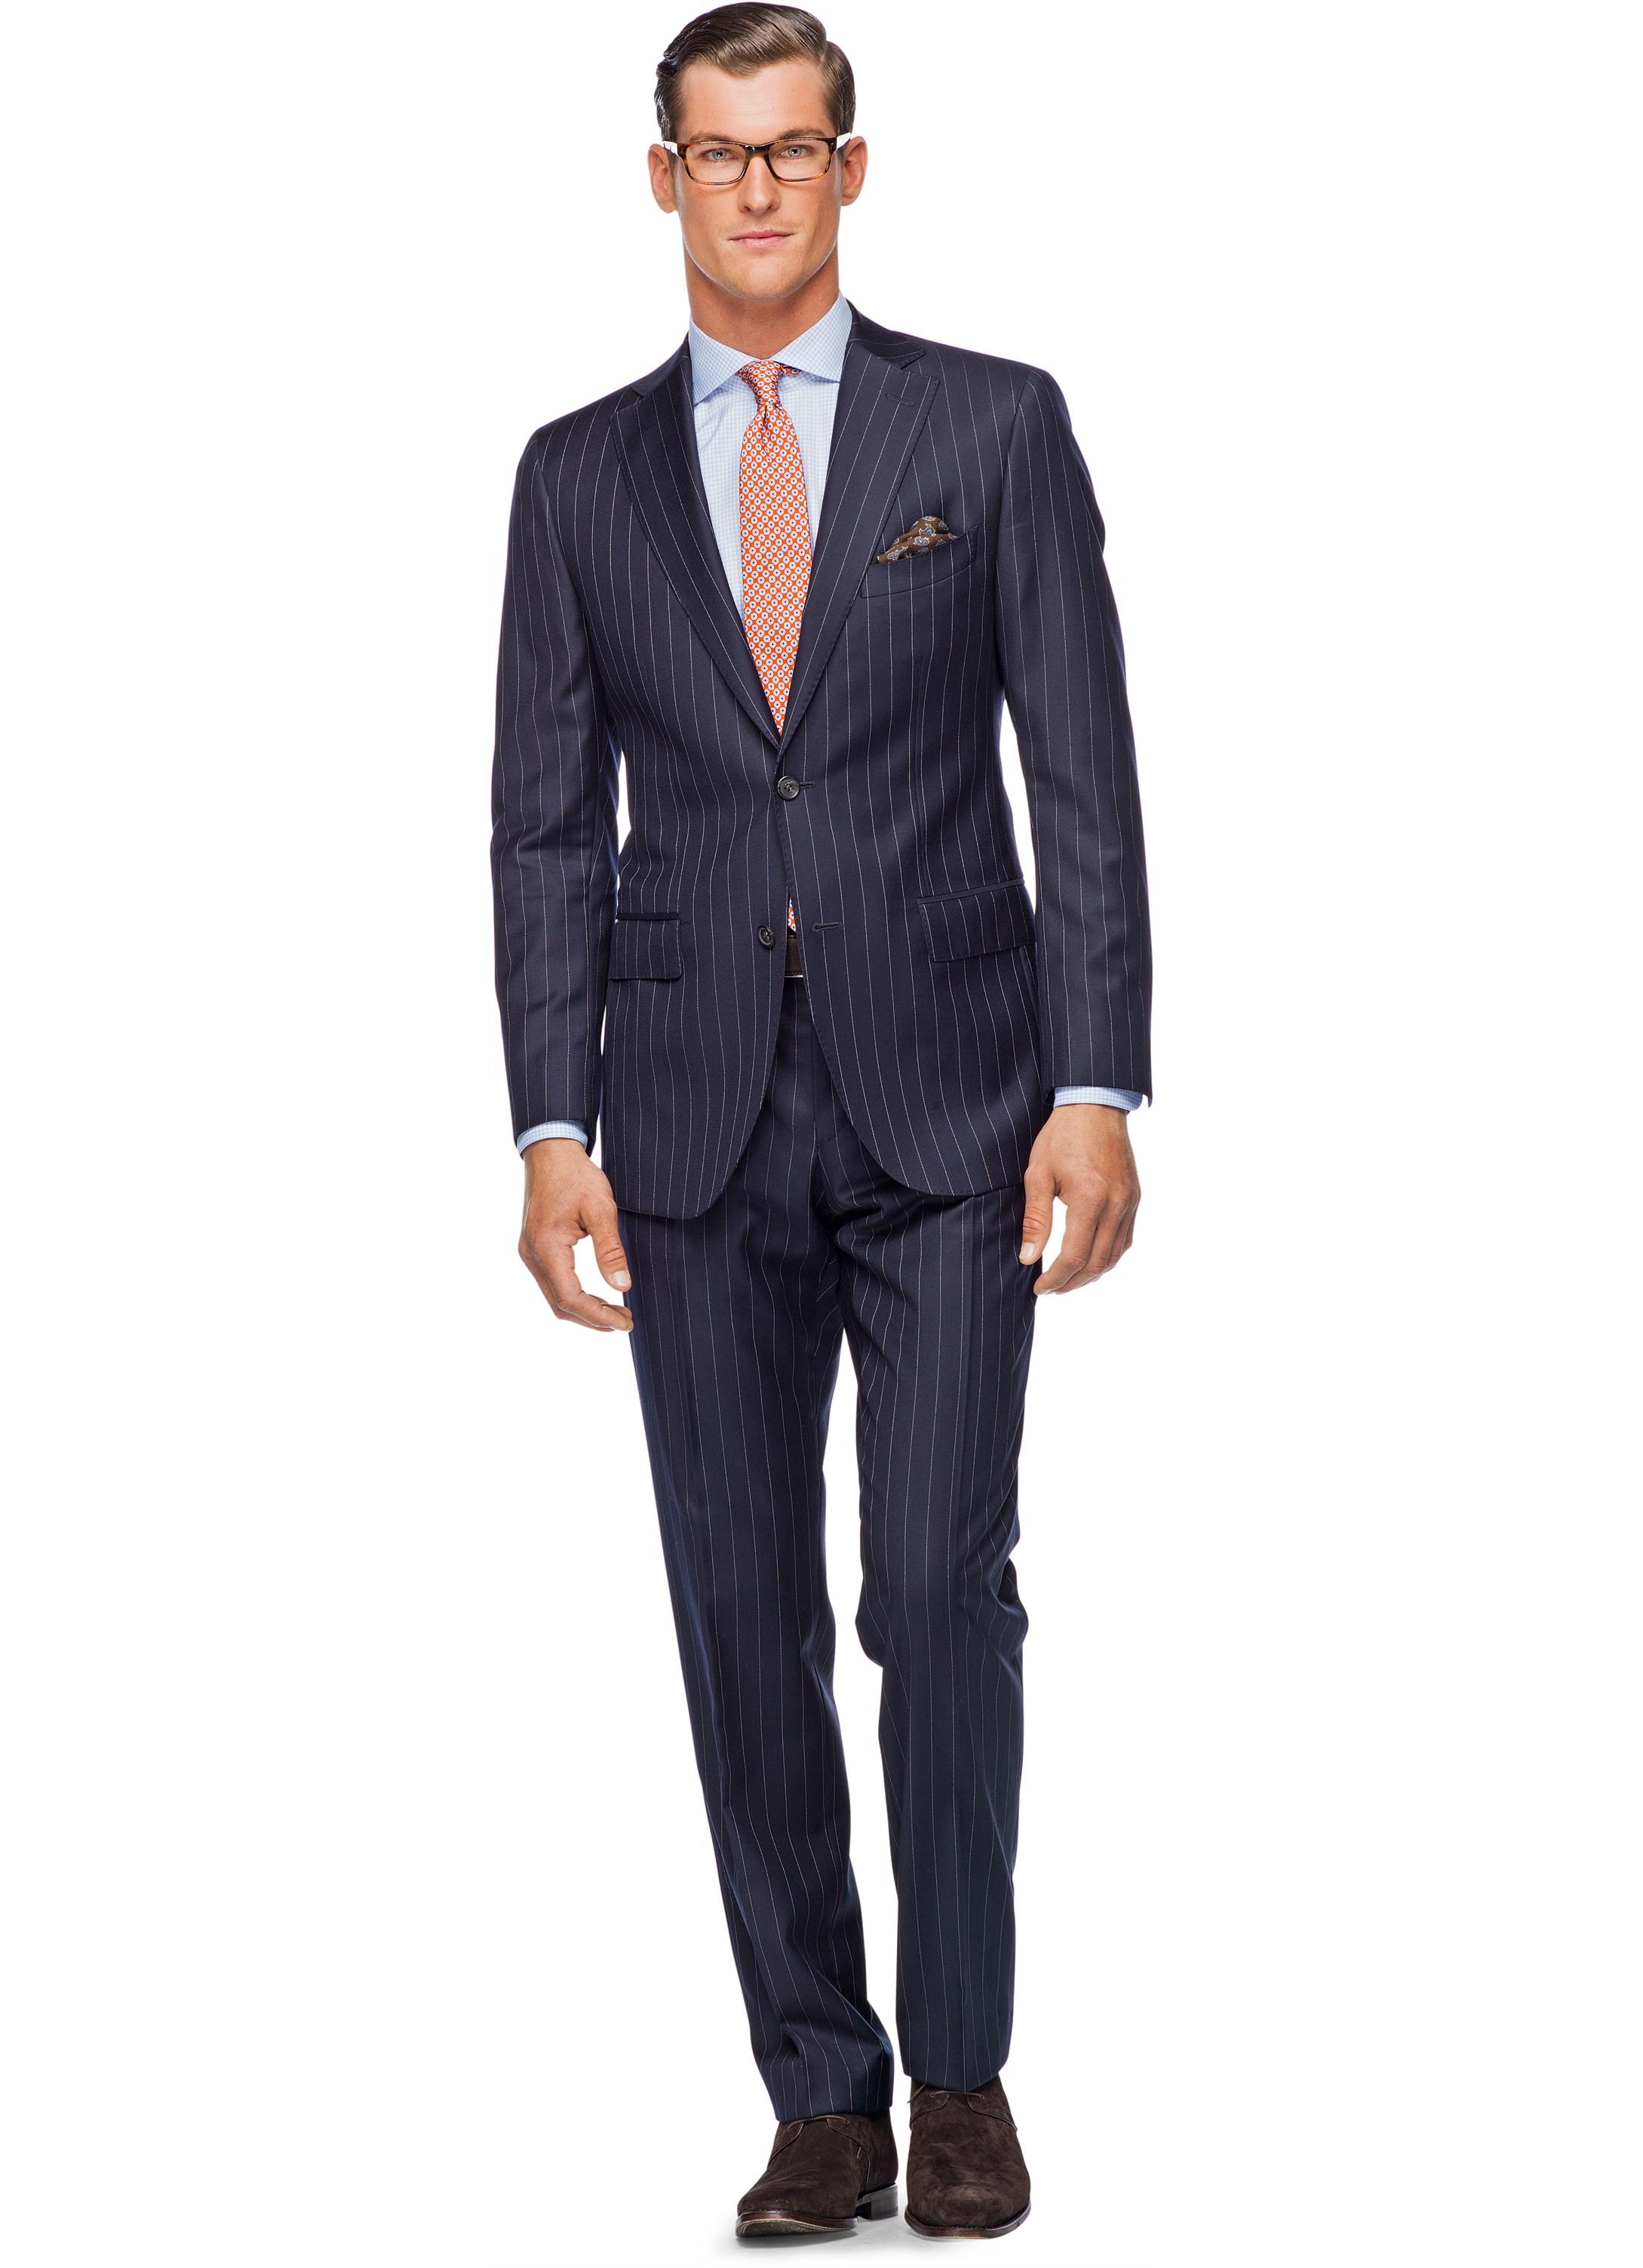 Suit Navy Stripe Napoli P2791ni